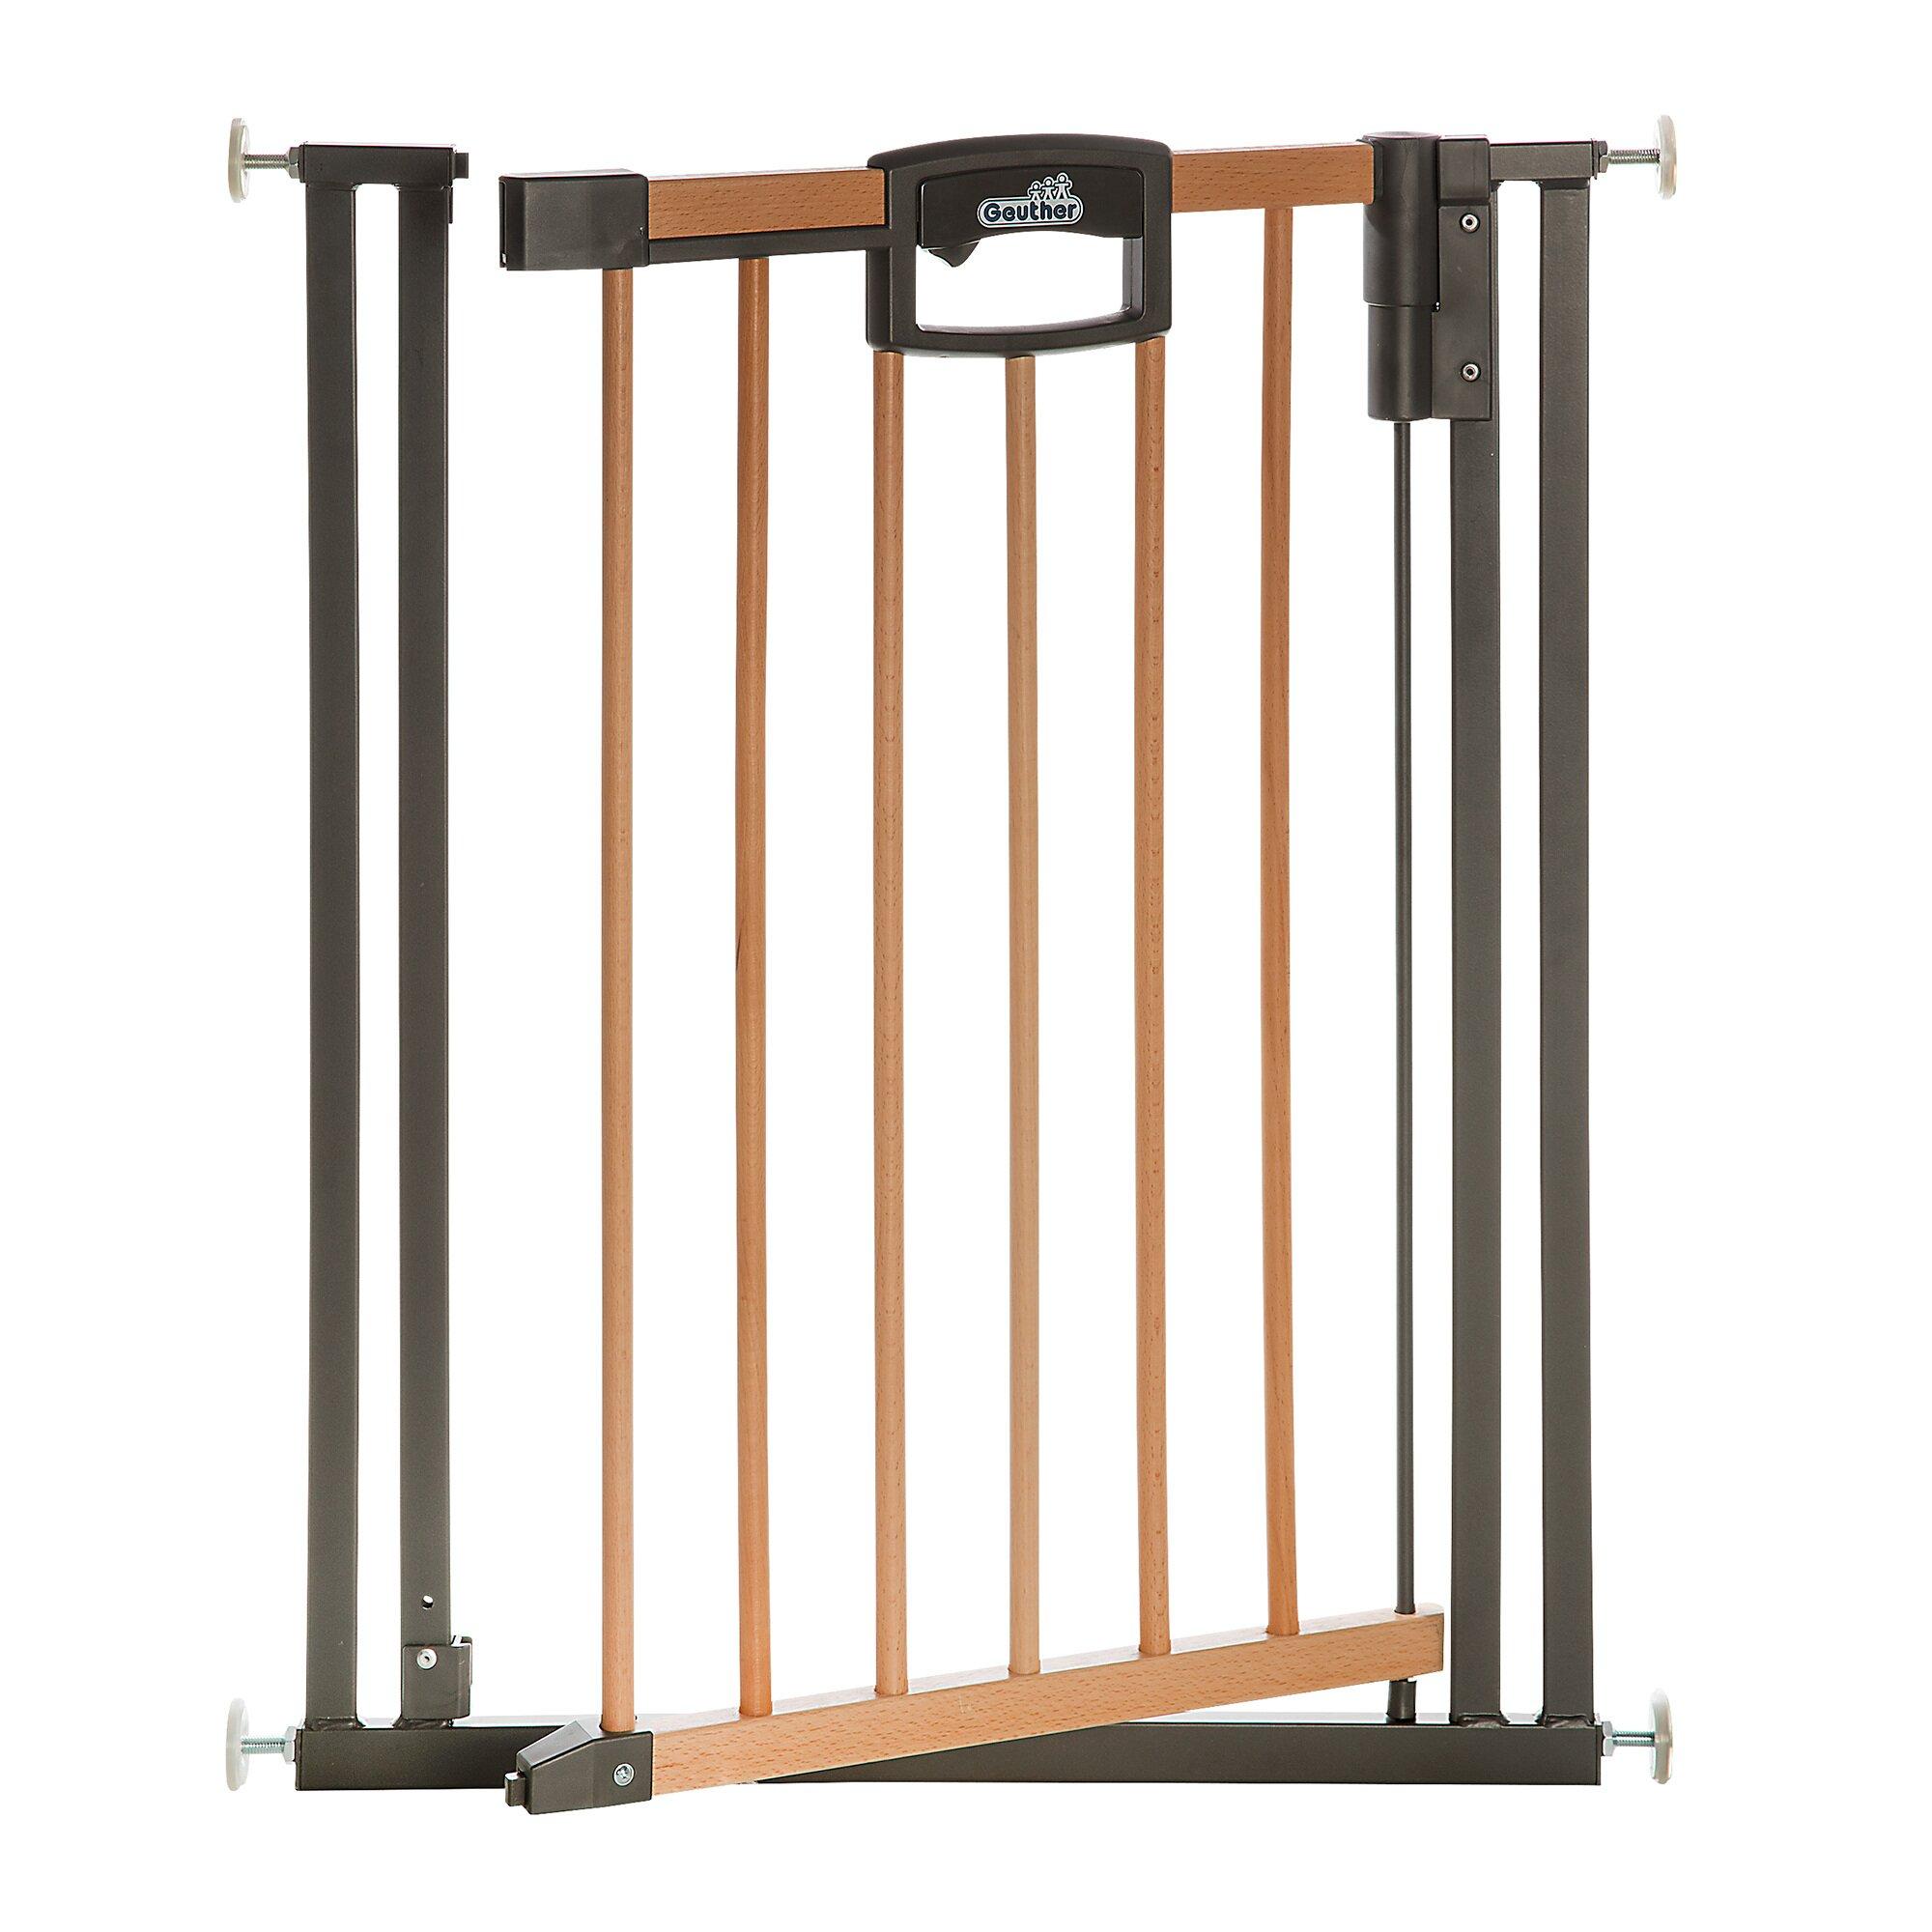 Geuther Türschutzgitter Easylock Wood Plus 80,5-88,5 cm